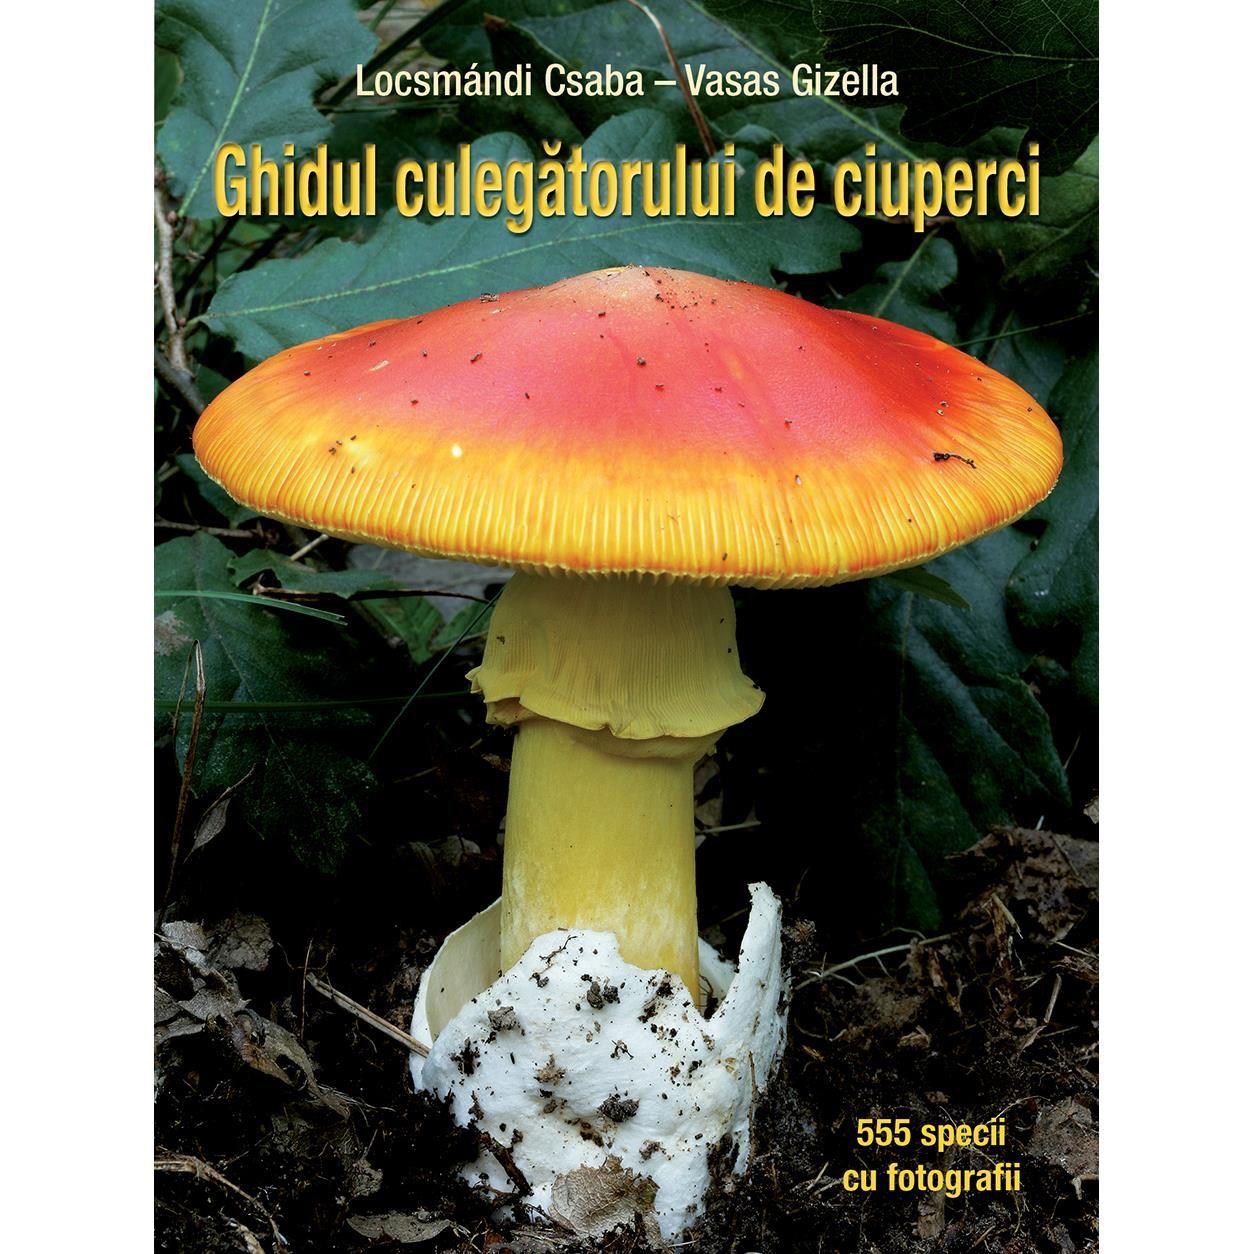 Ciuperci otrăvitoare - Wikipedia